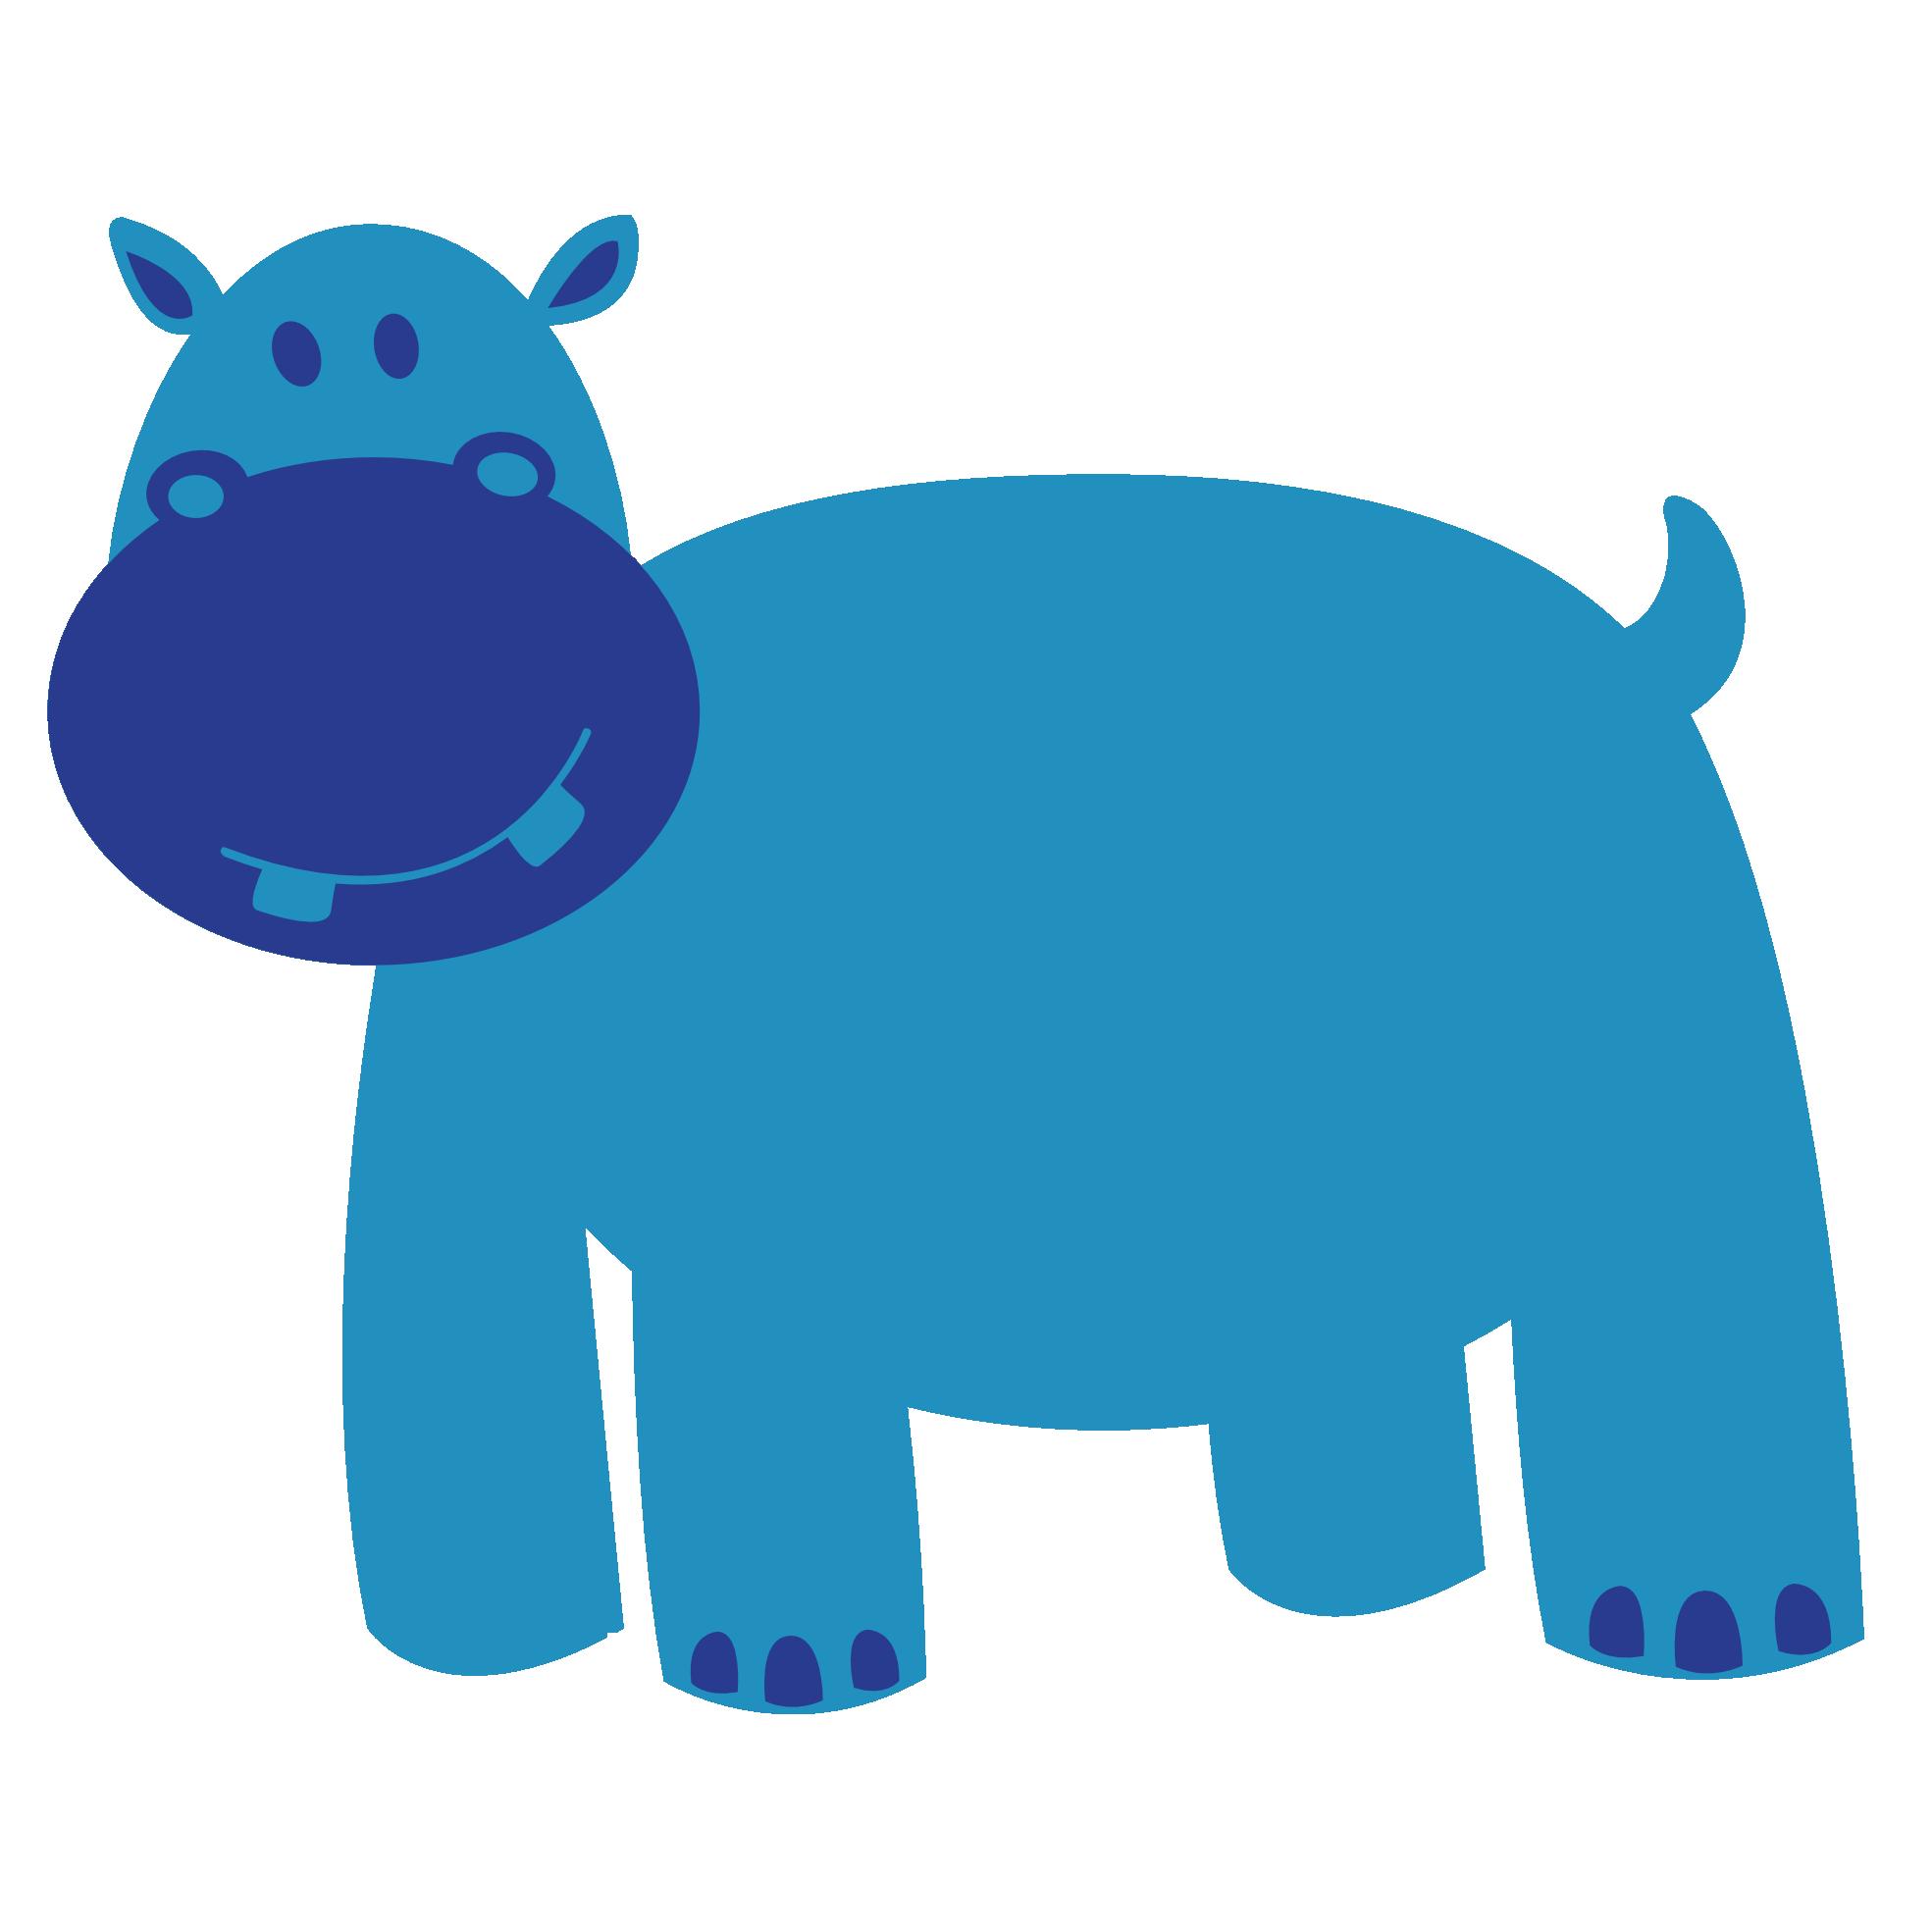 Geometry clipart animal. Clipartist net clip art